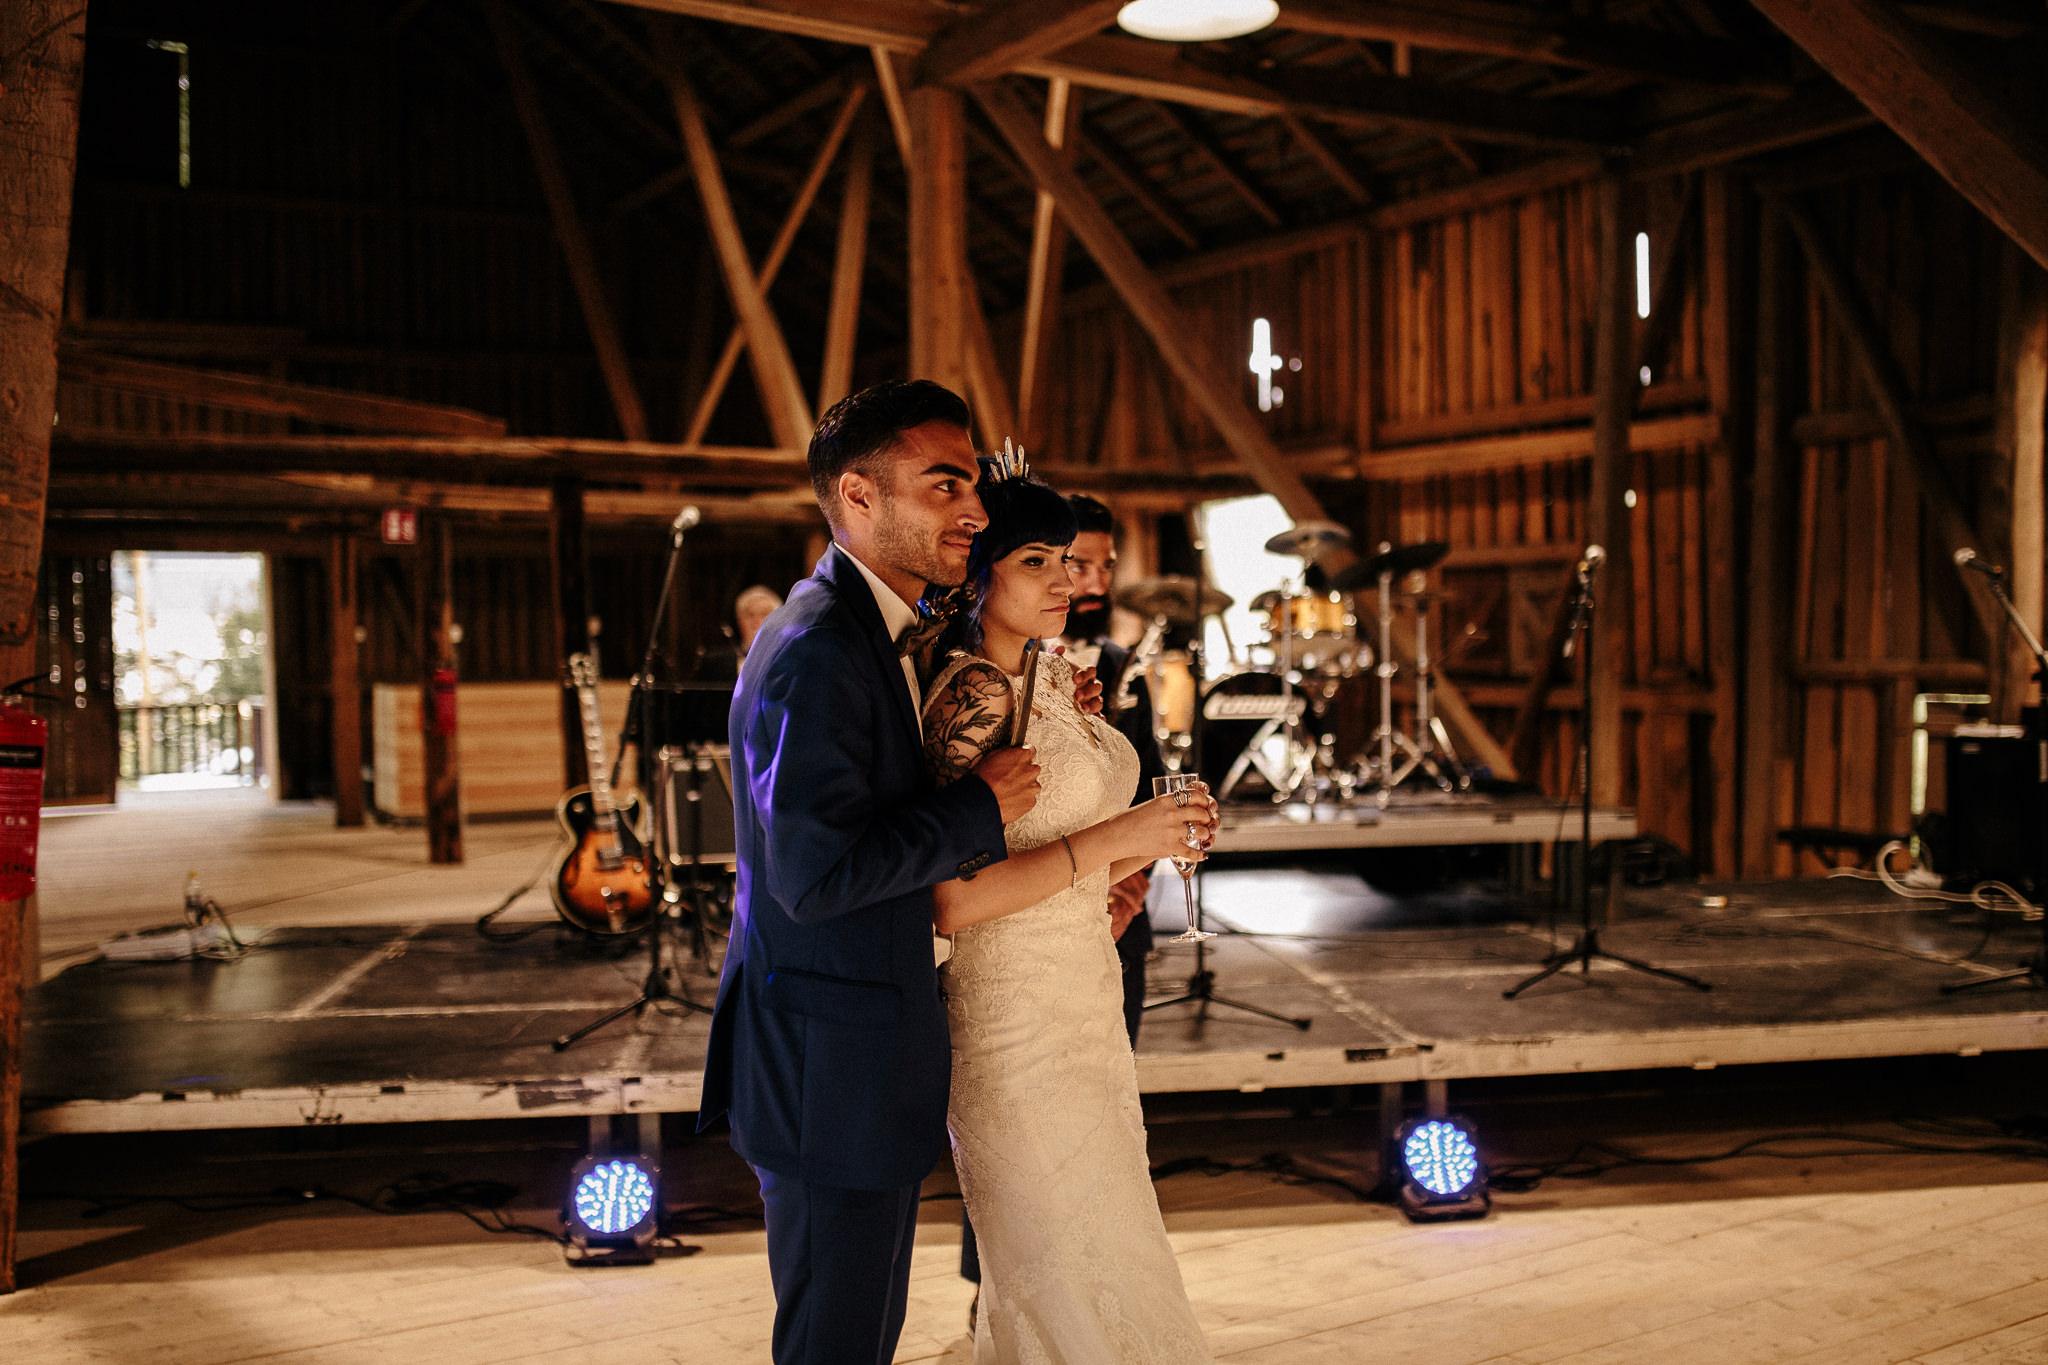 Ceren & Jani - Finland Wedding Photographer - Weddings by Qay - Wedding Photographer (124 of 166).jpg